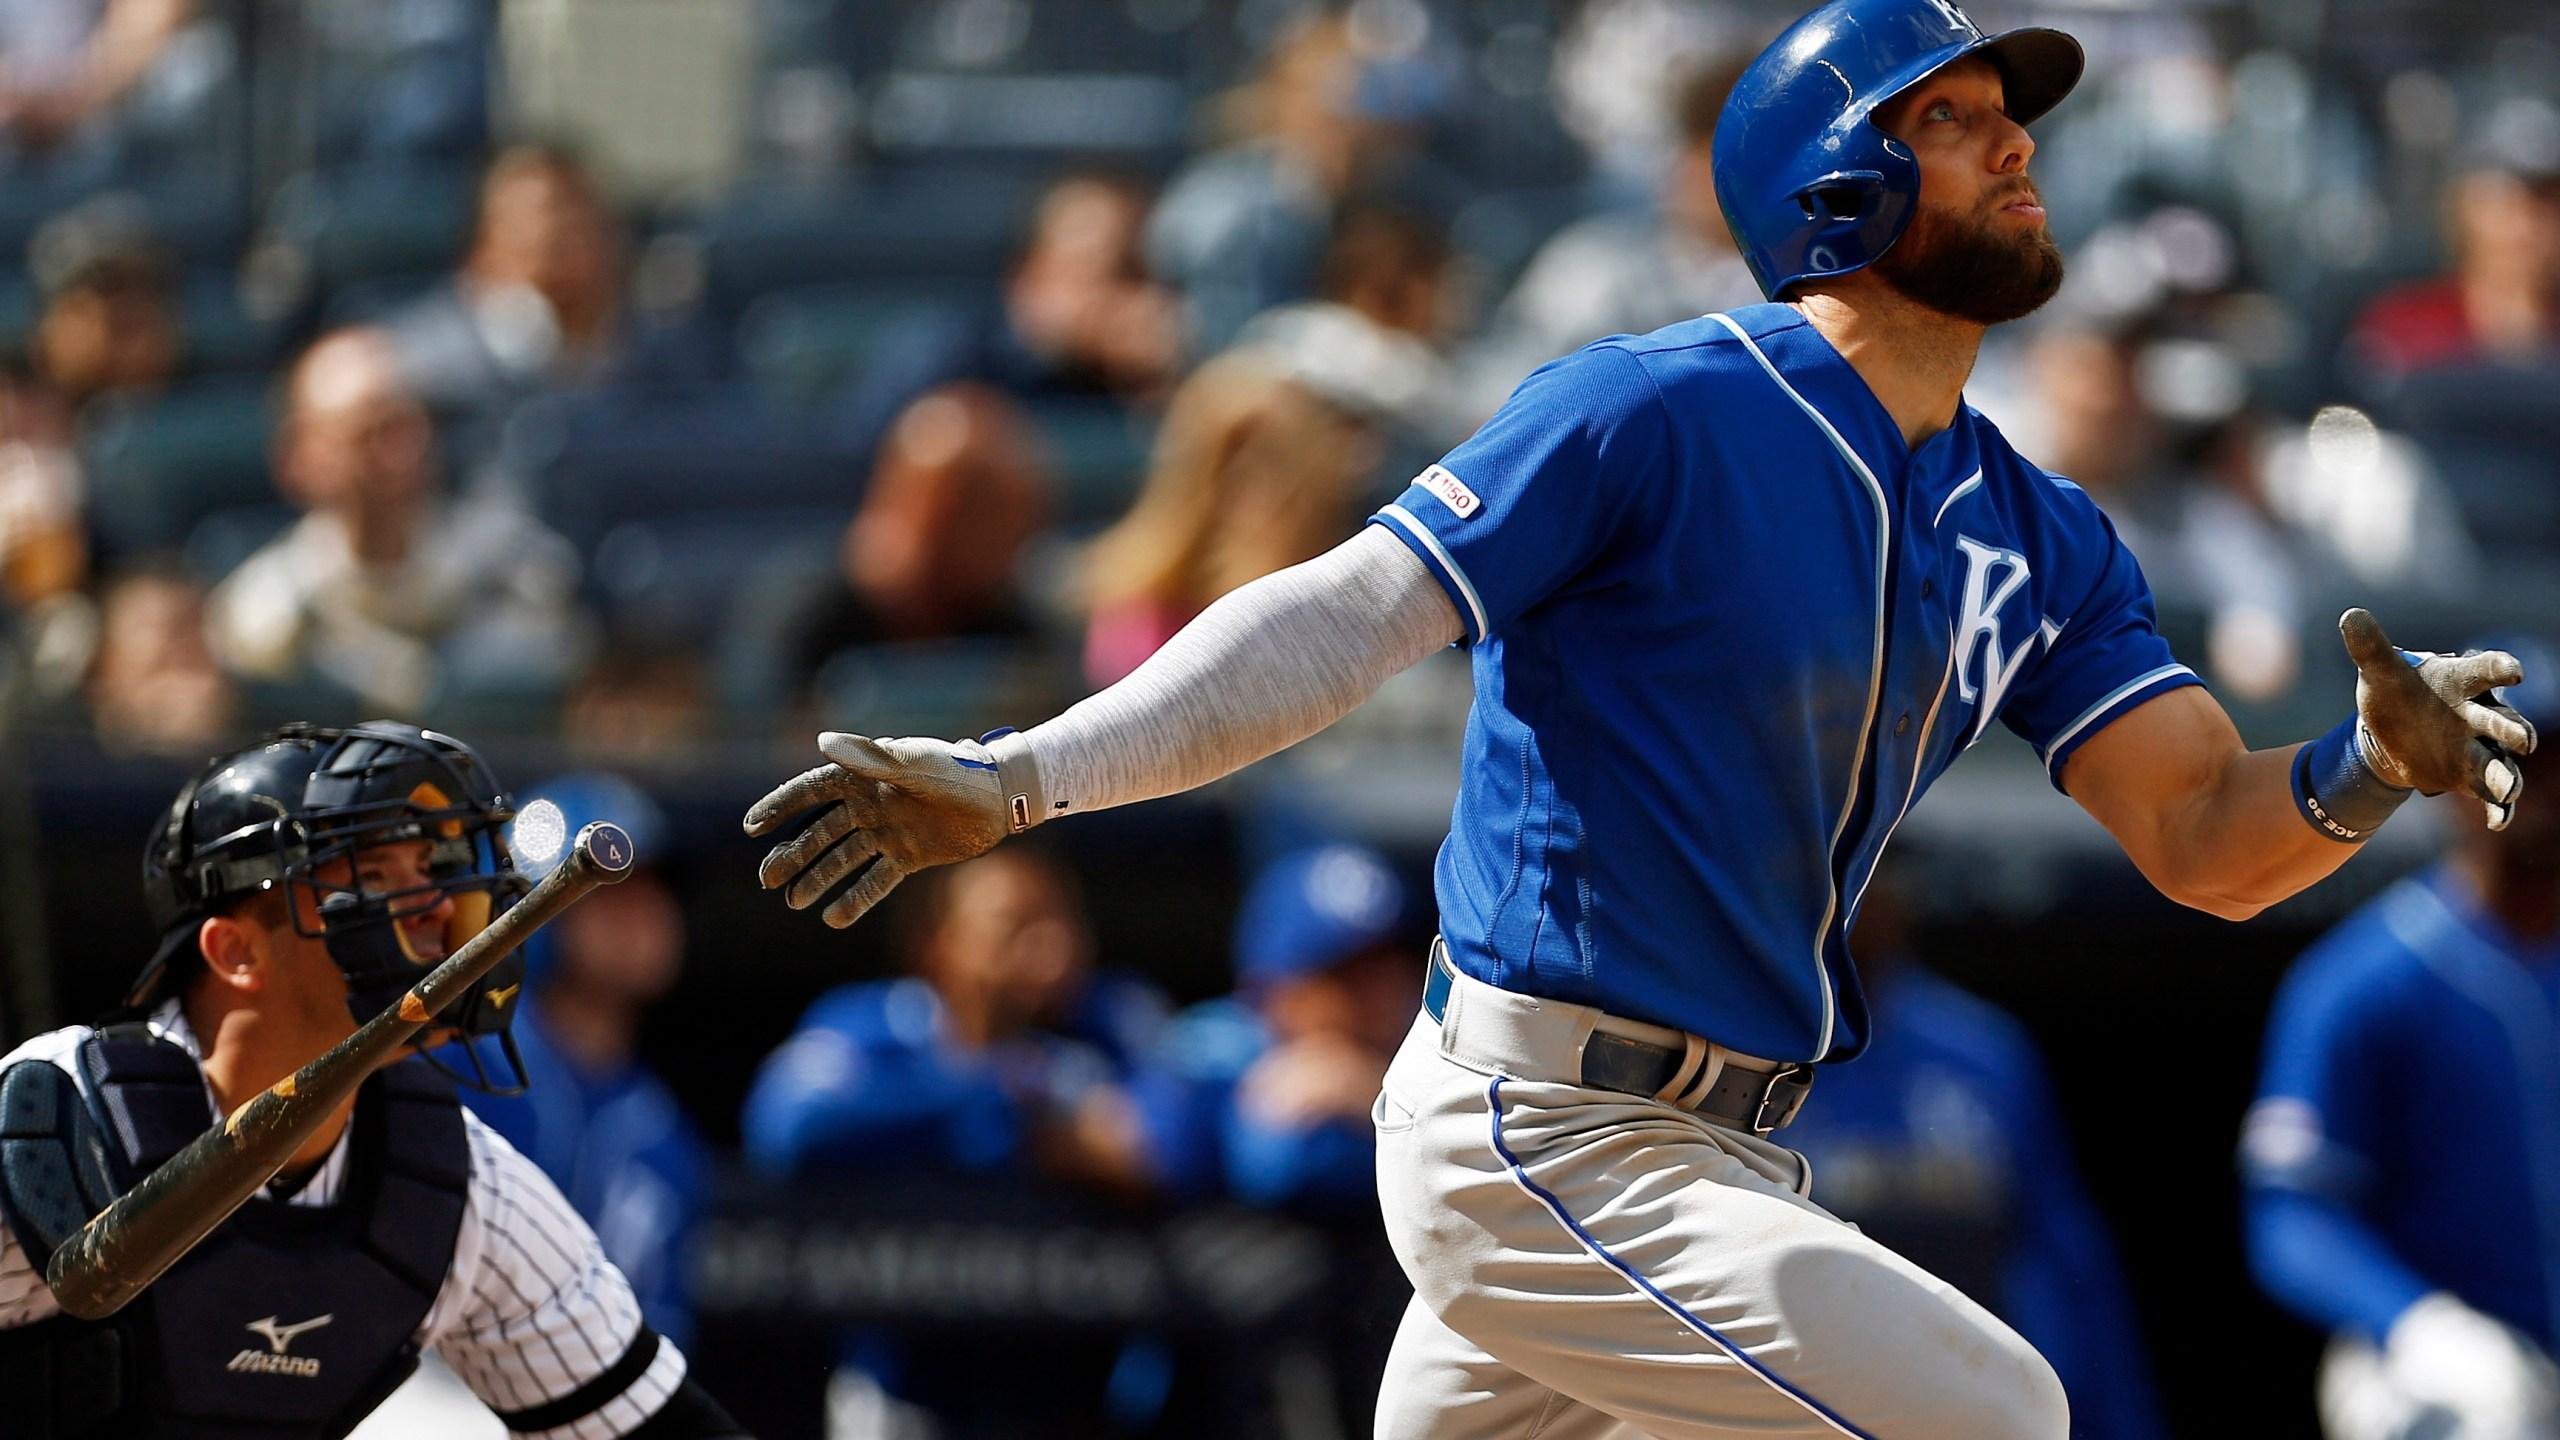 Royals_Yankees_Baseball_11967-159532.jpg65953357